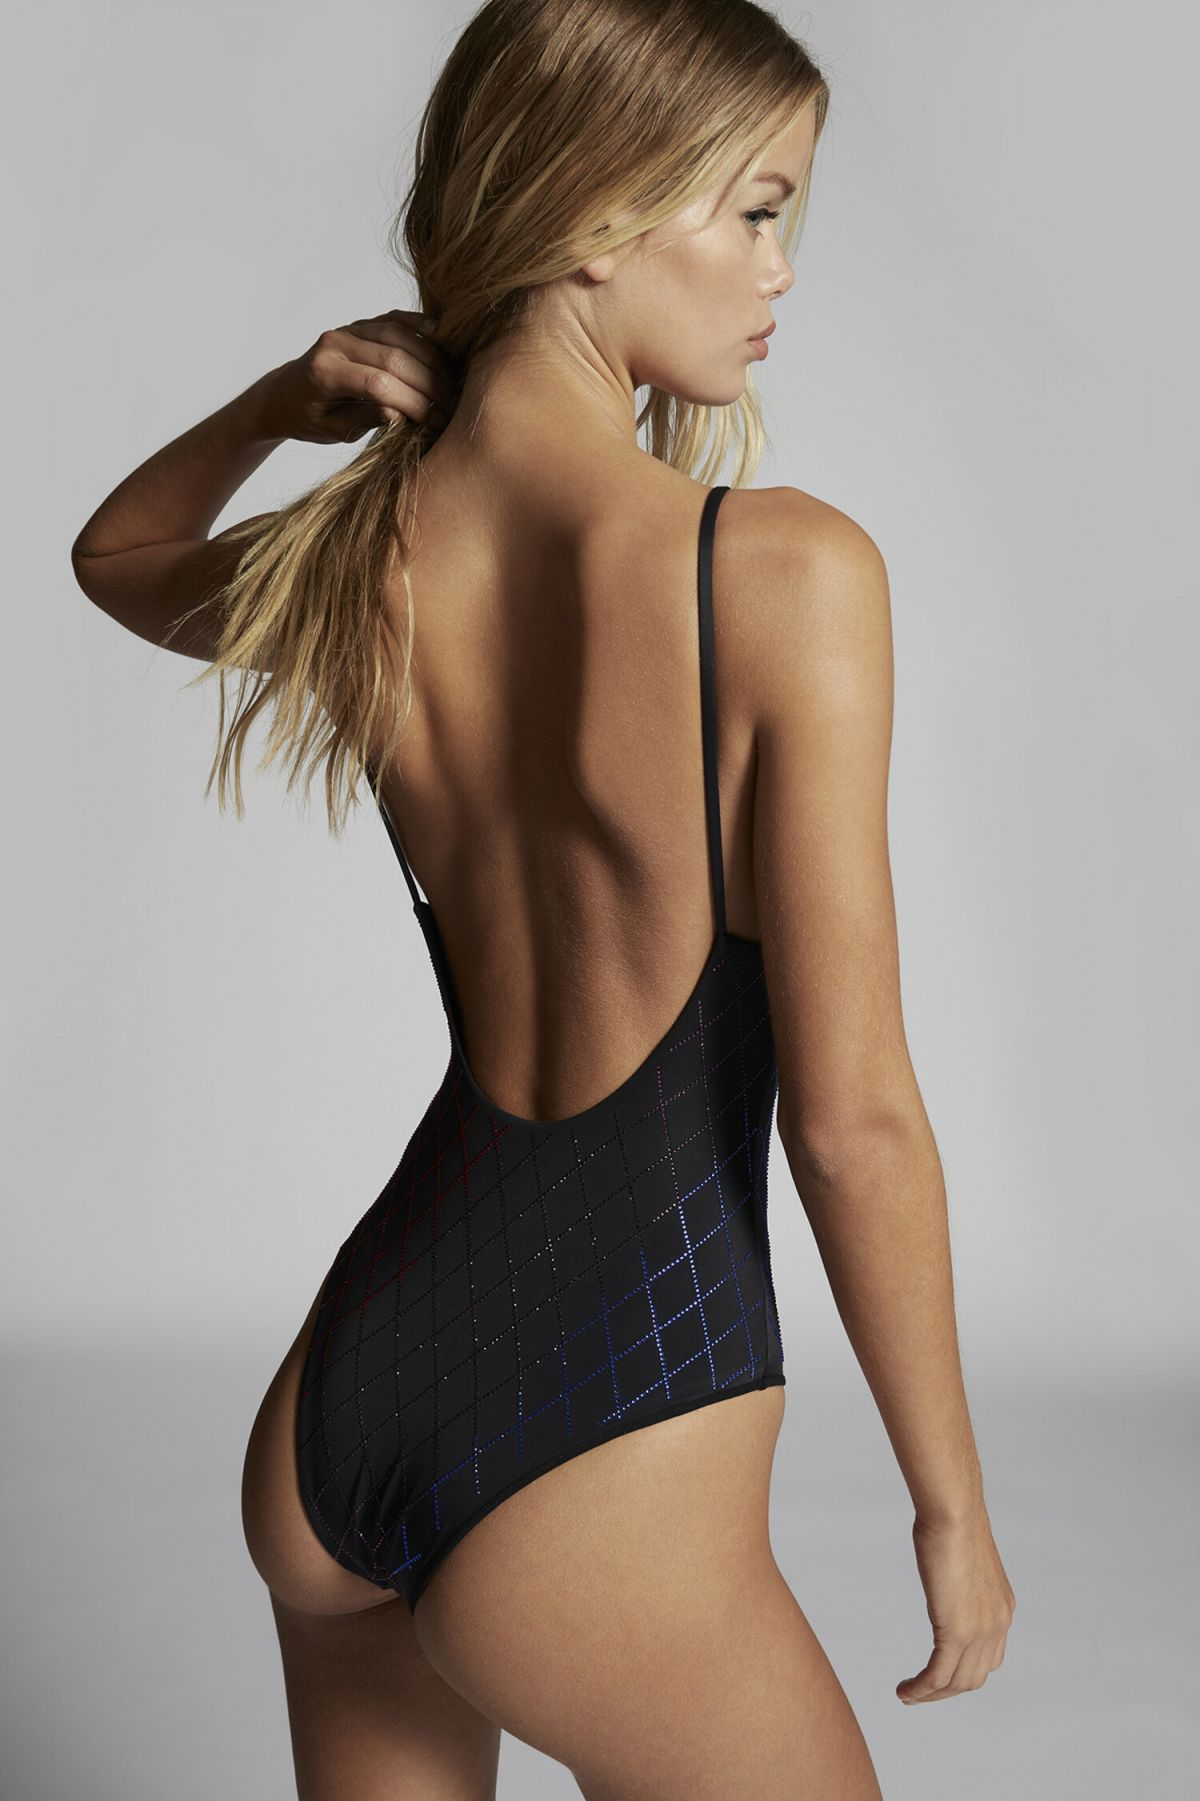 Frida Aasen Sexy Body